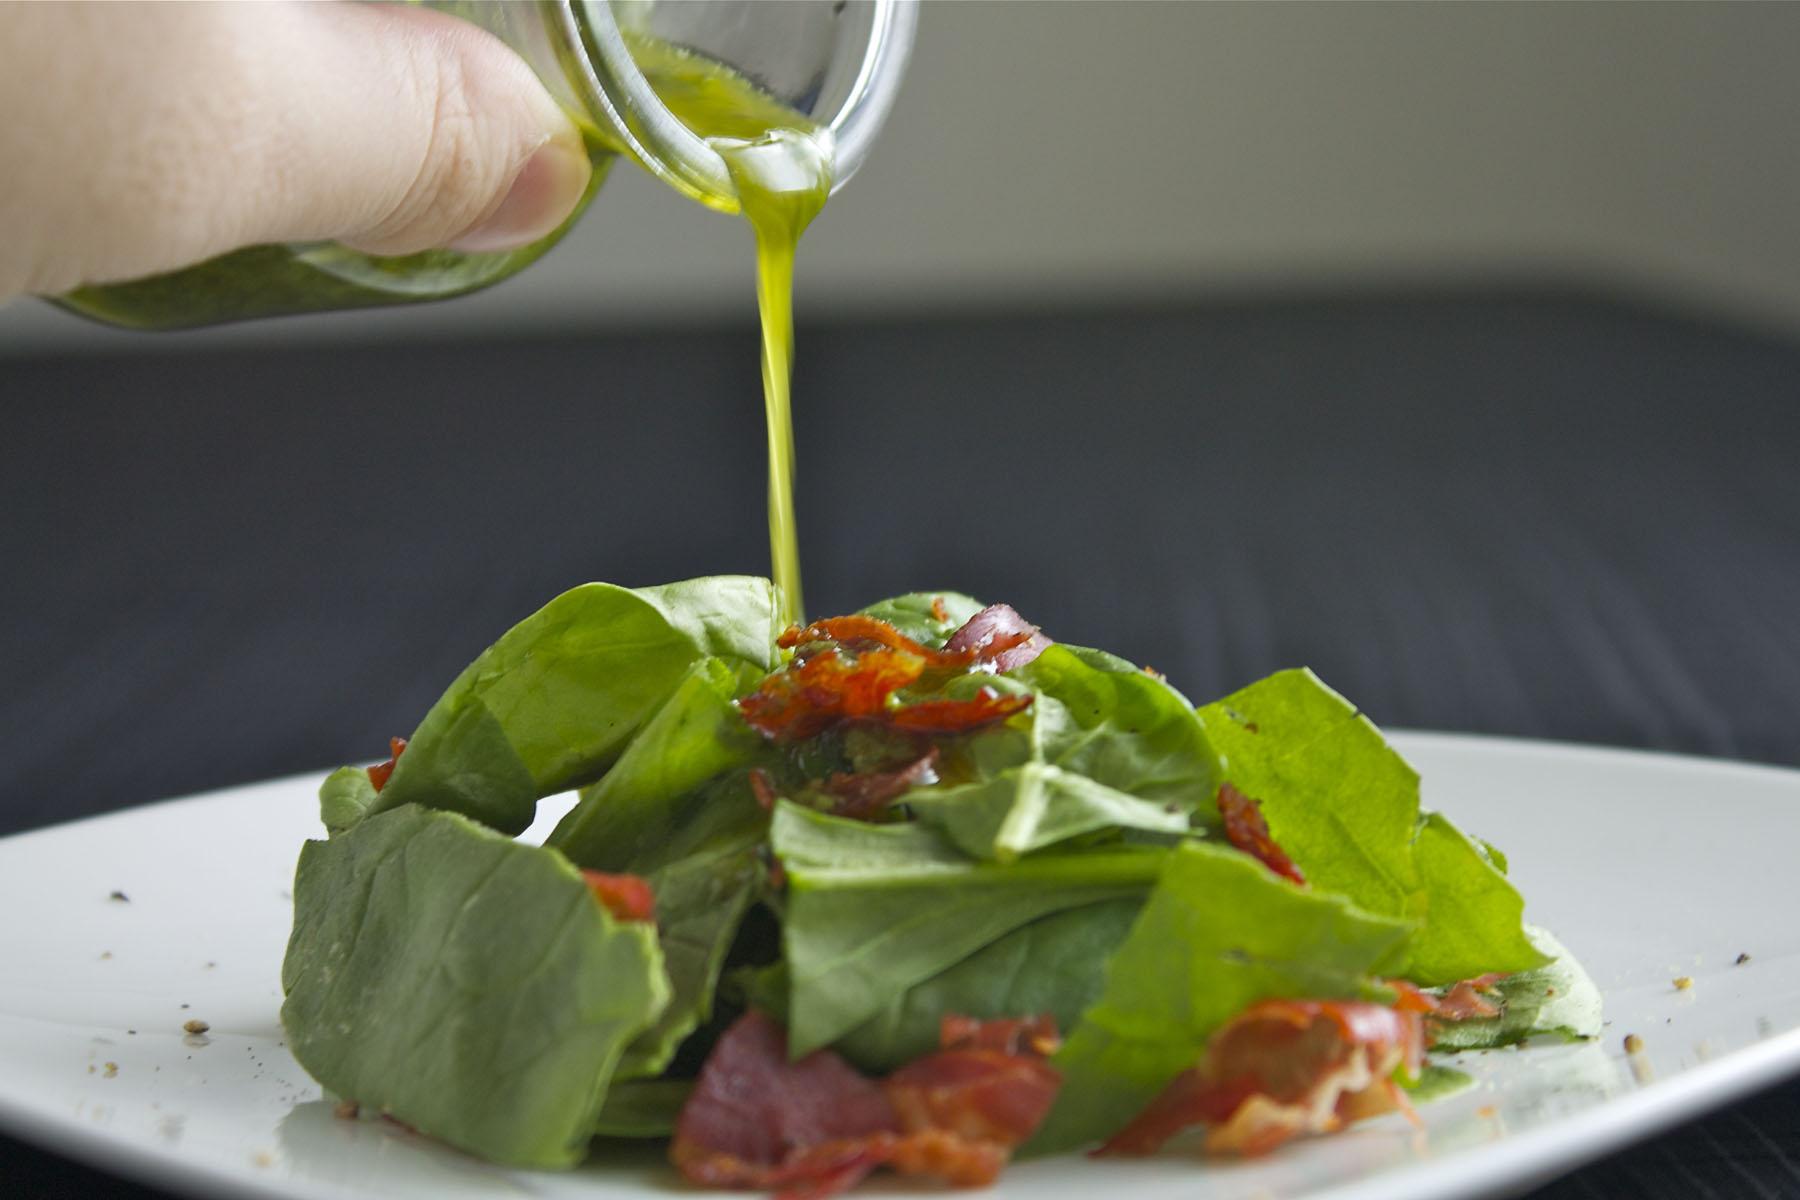 Spinach Prosciutto Salad with Basil Vinaigrette